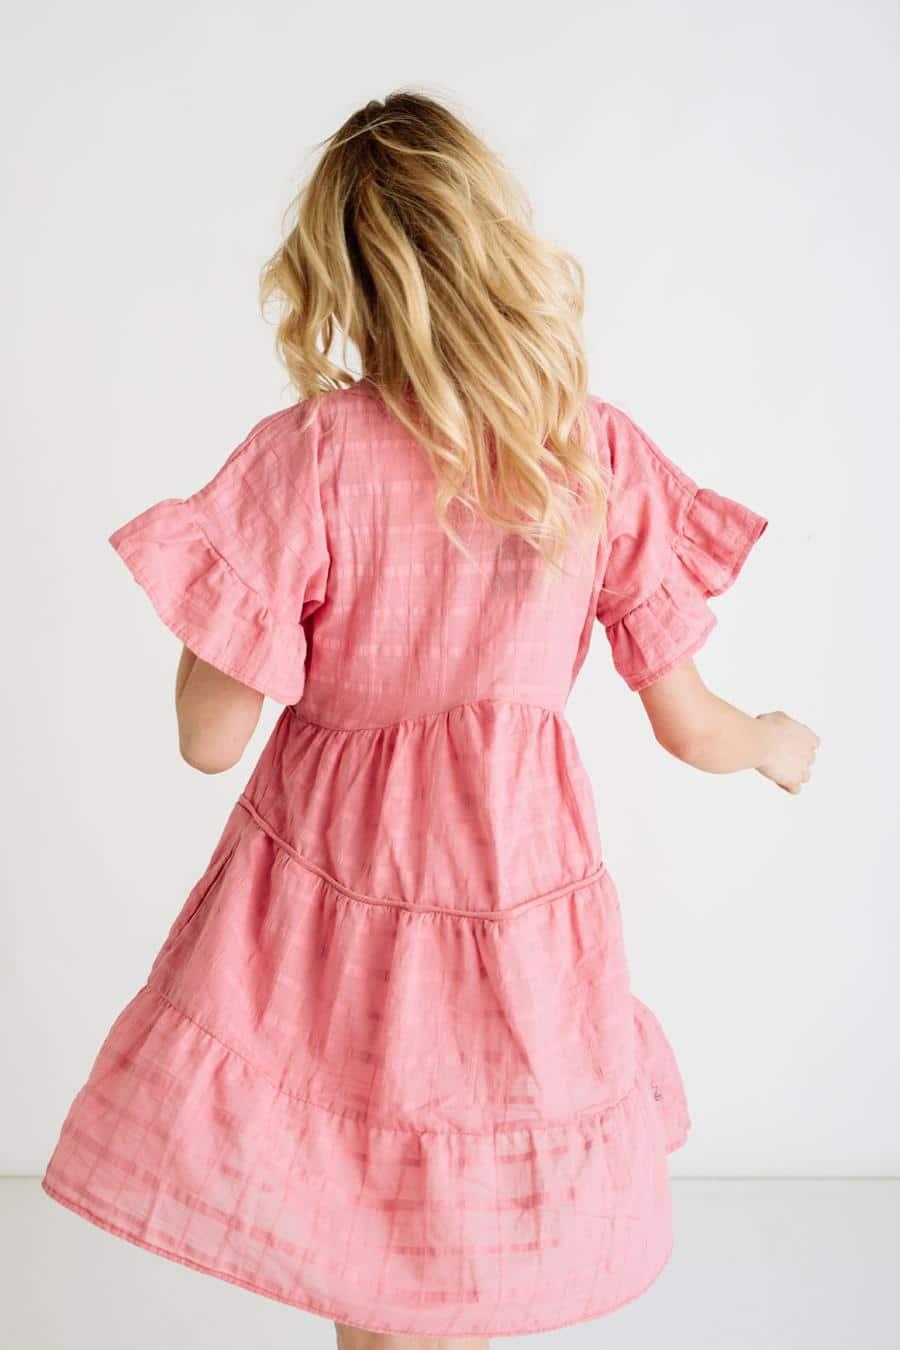 jagger zenska haljina kolekcija prolece leto 2021 ss 2021 kupi online jg 5502 10 2